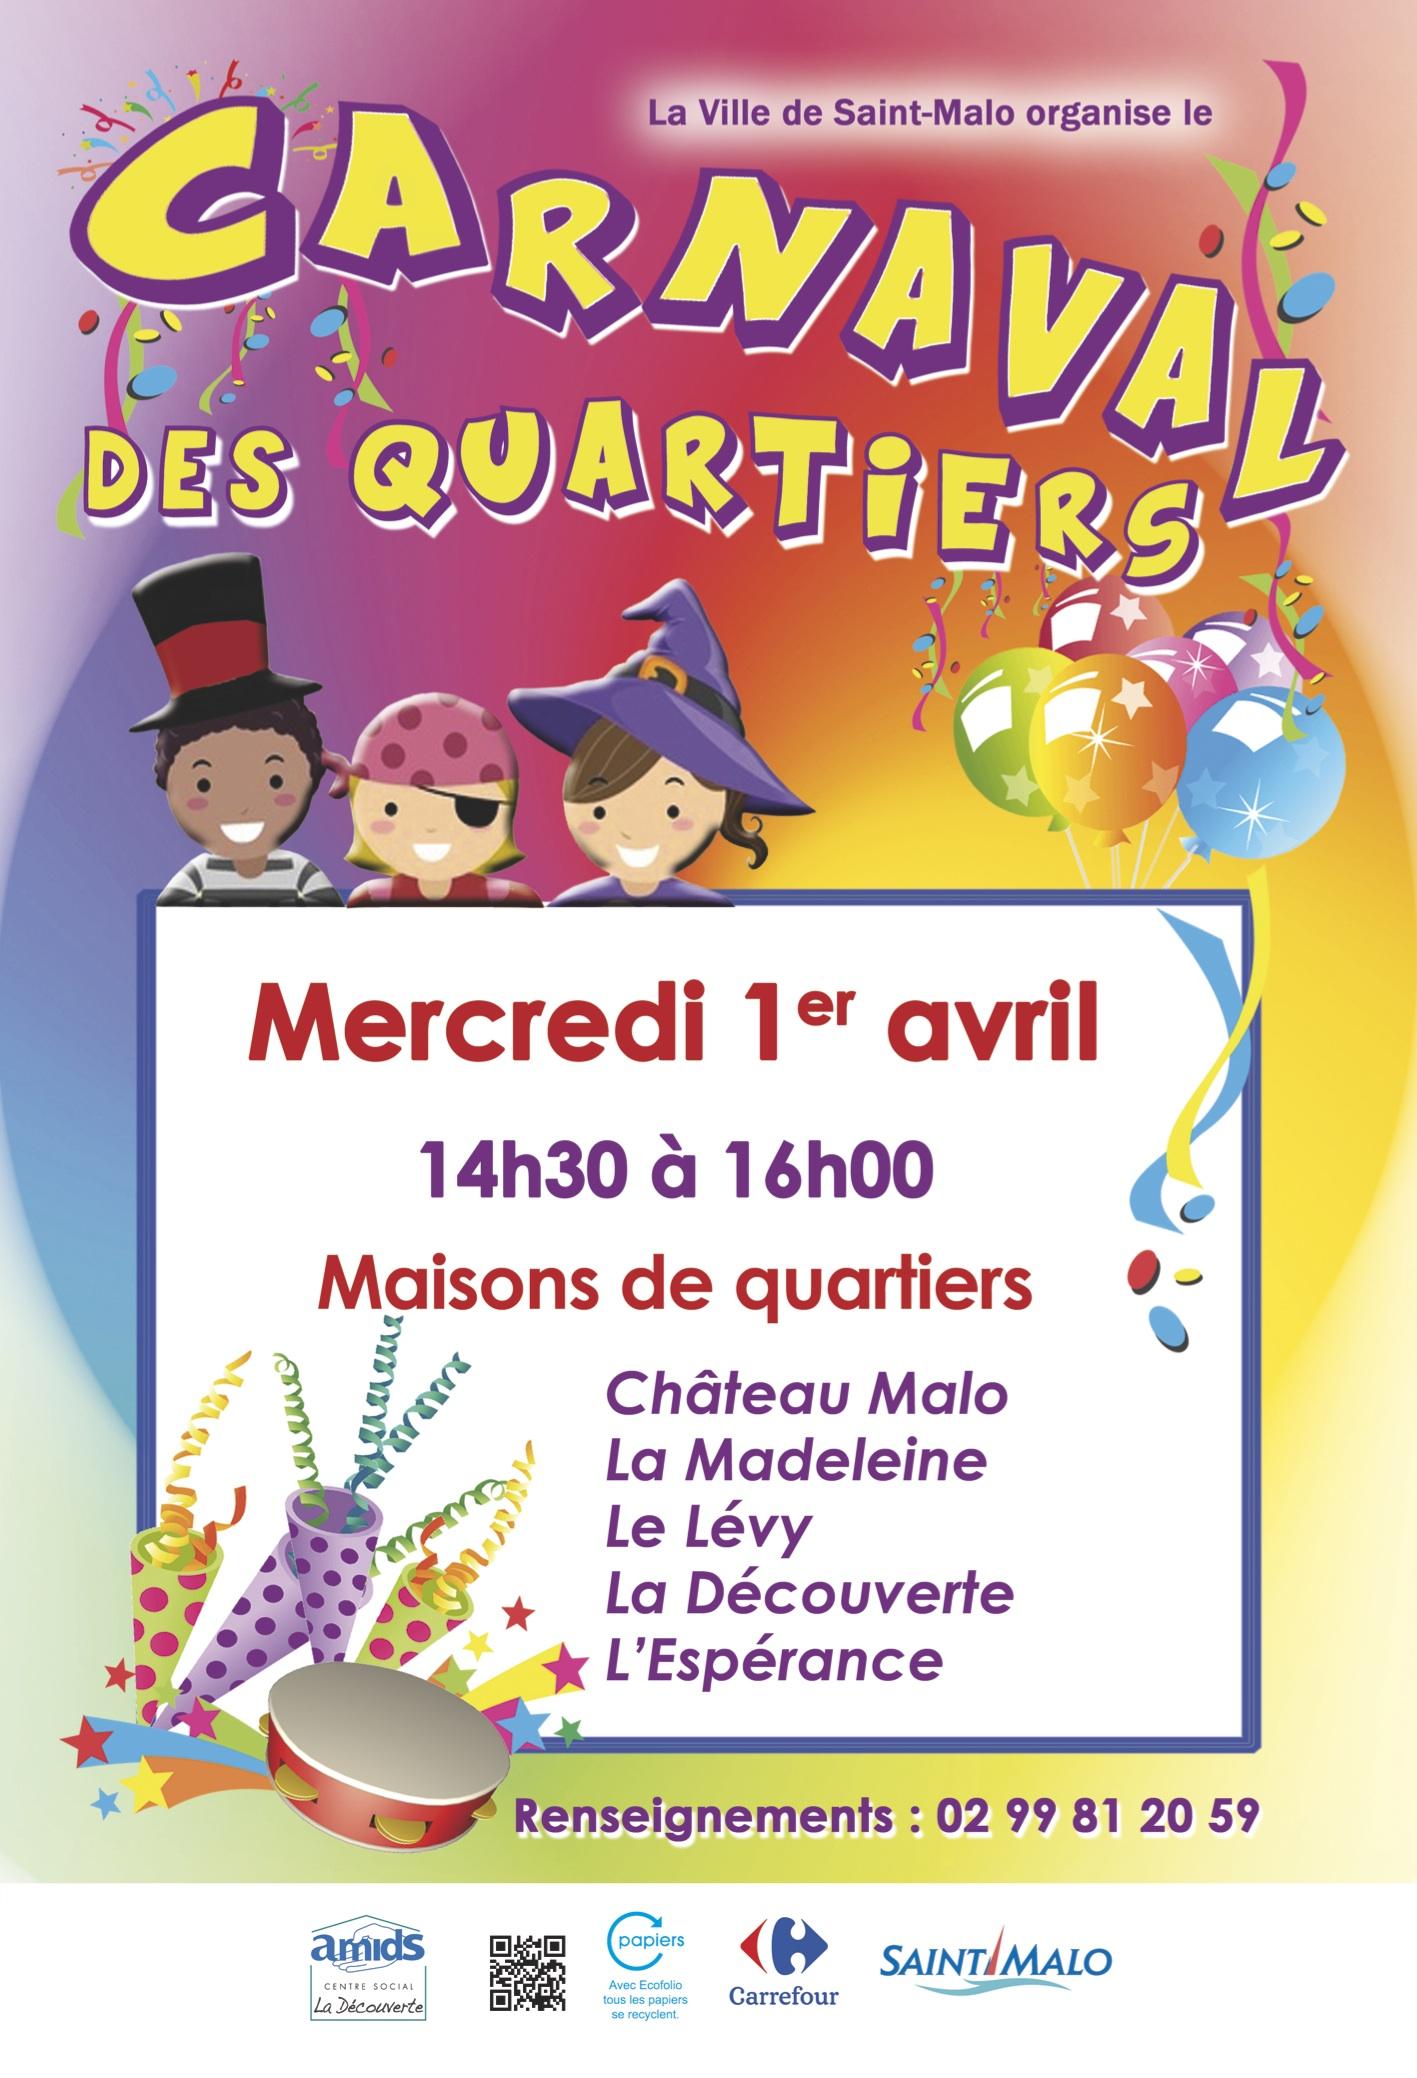 carnaval-saint-malo-2015-carnaval-quartiers